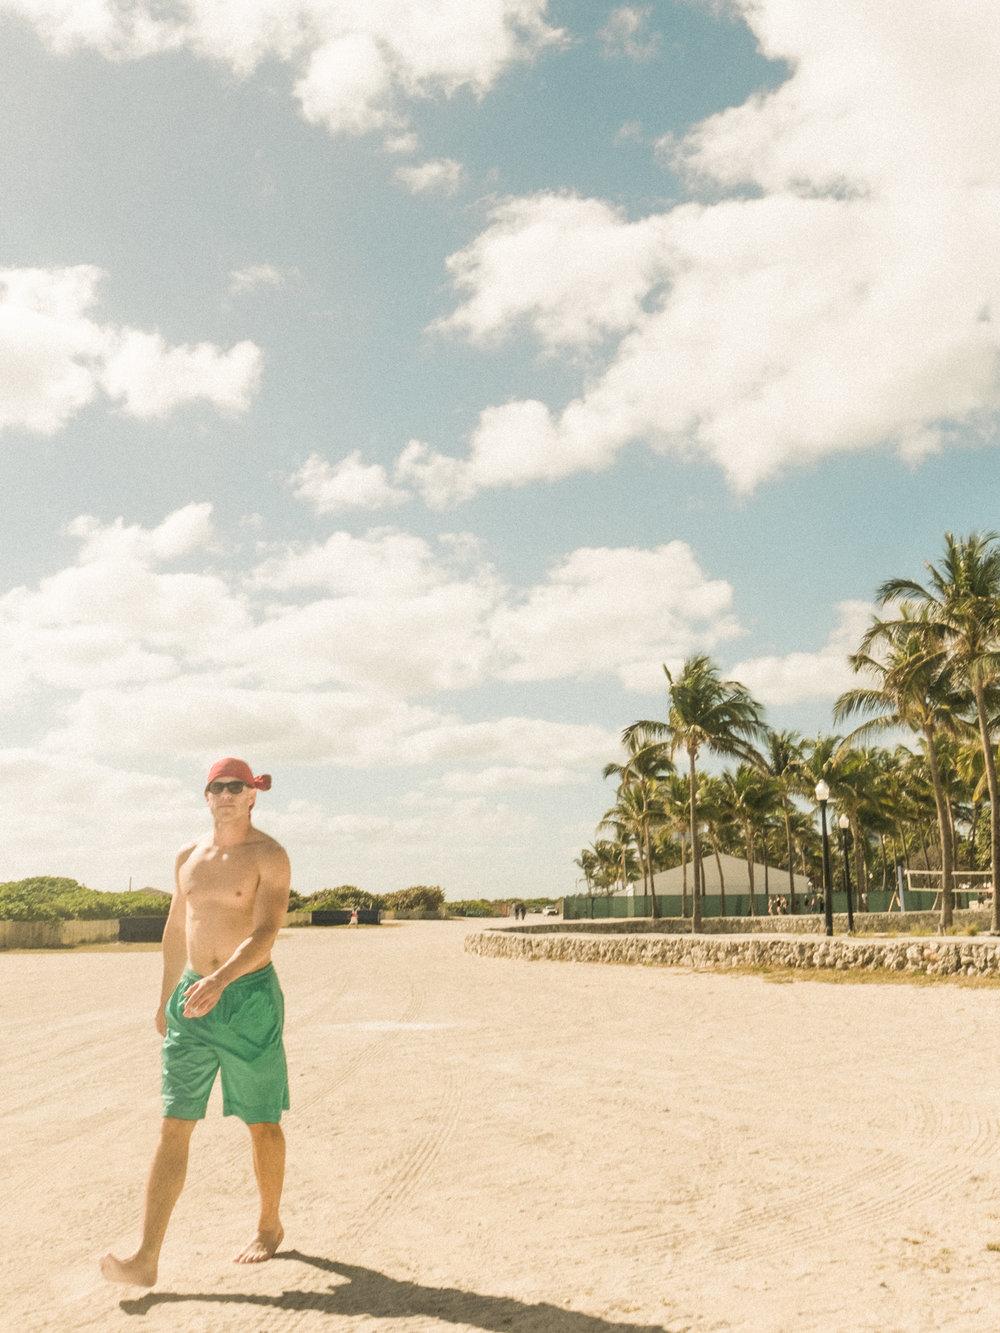 Miami_Beach_Street_46.jpg